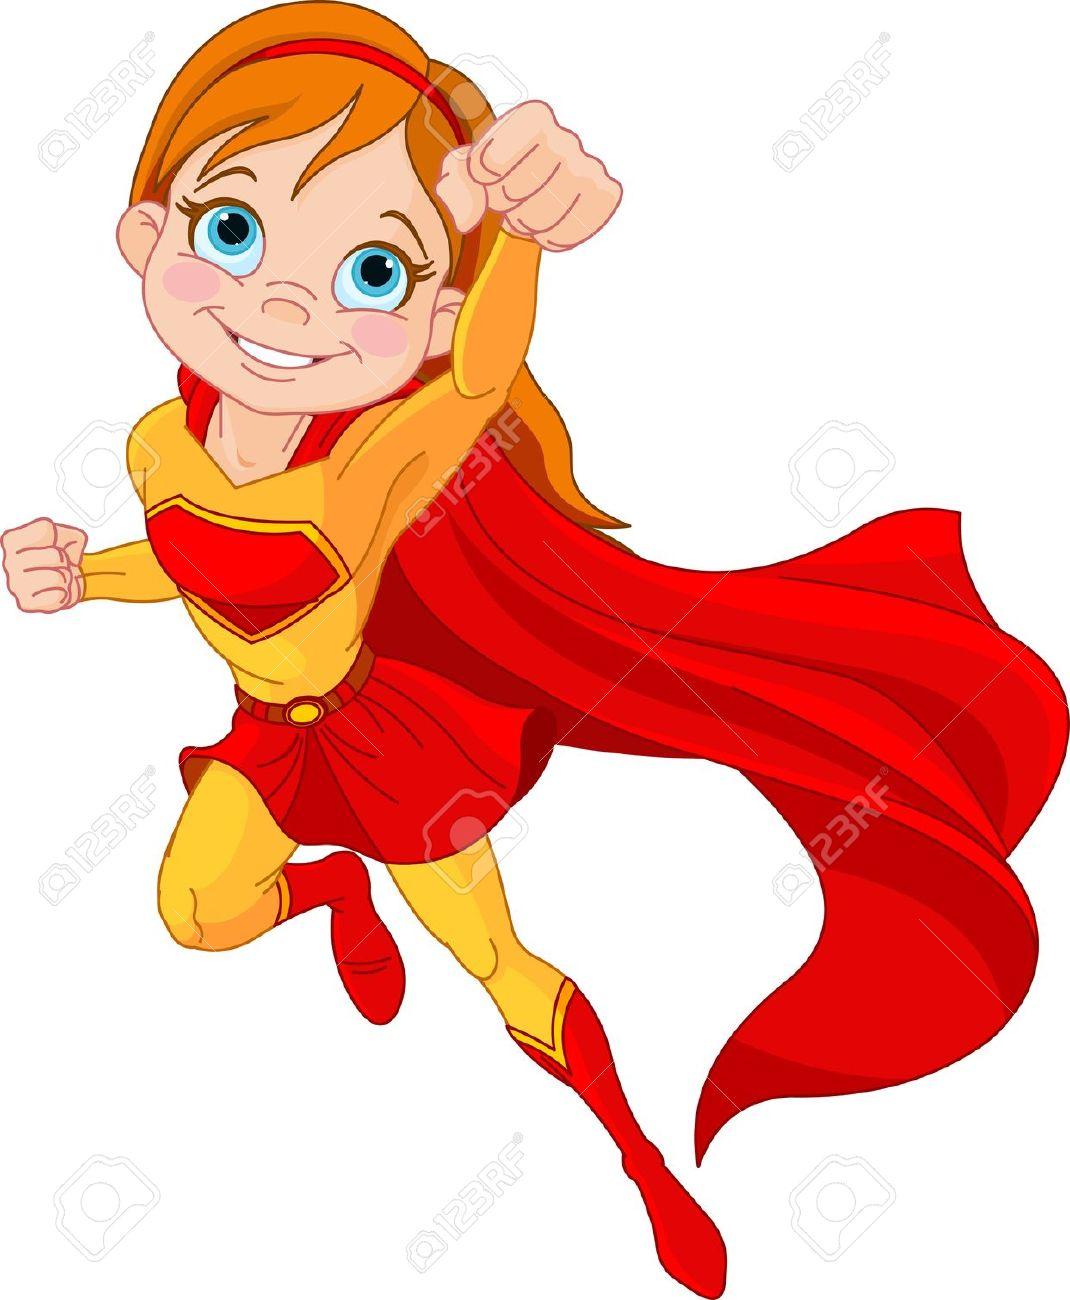 Generic super boy and super girl clipart svg black and white stock Generic super boy and super girl clipart - ClipartFox svg black and white stock